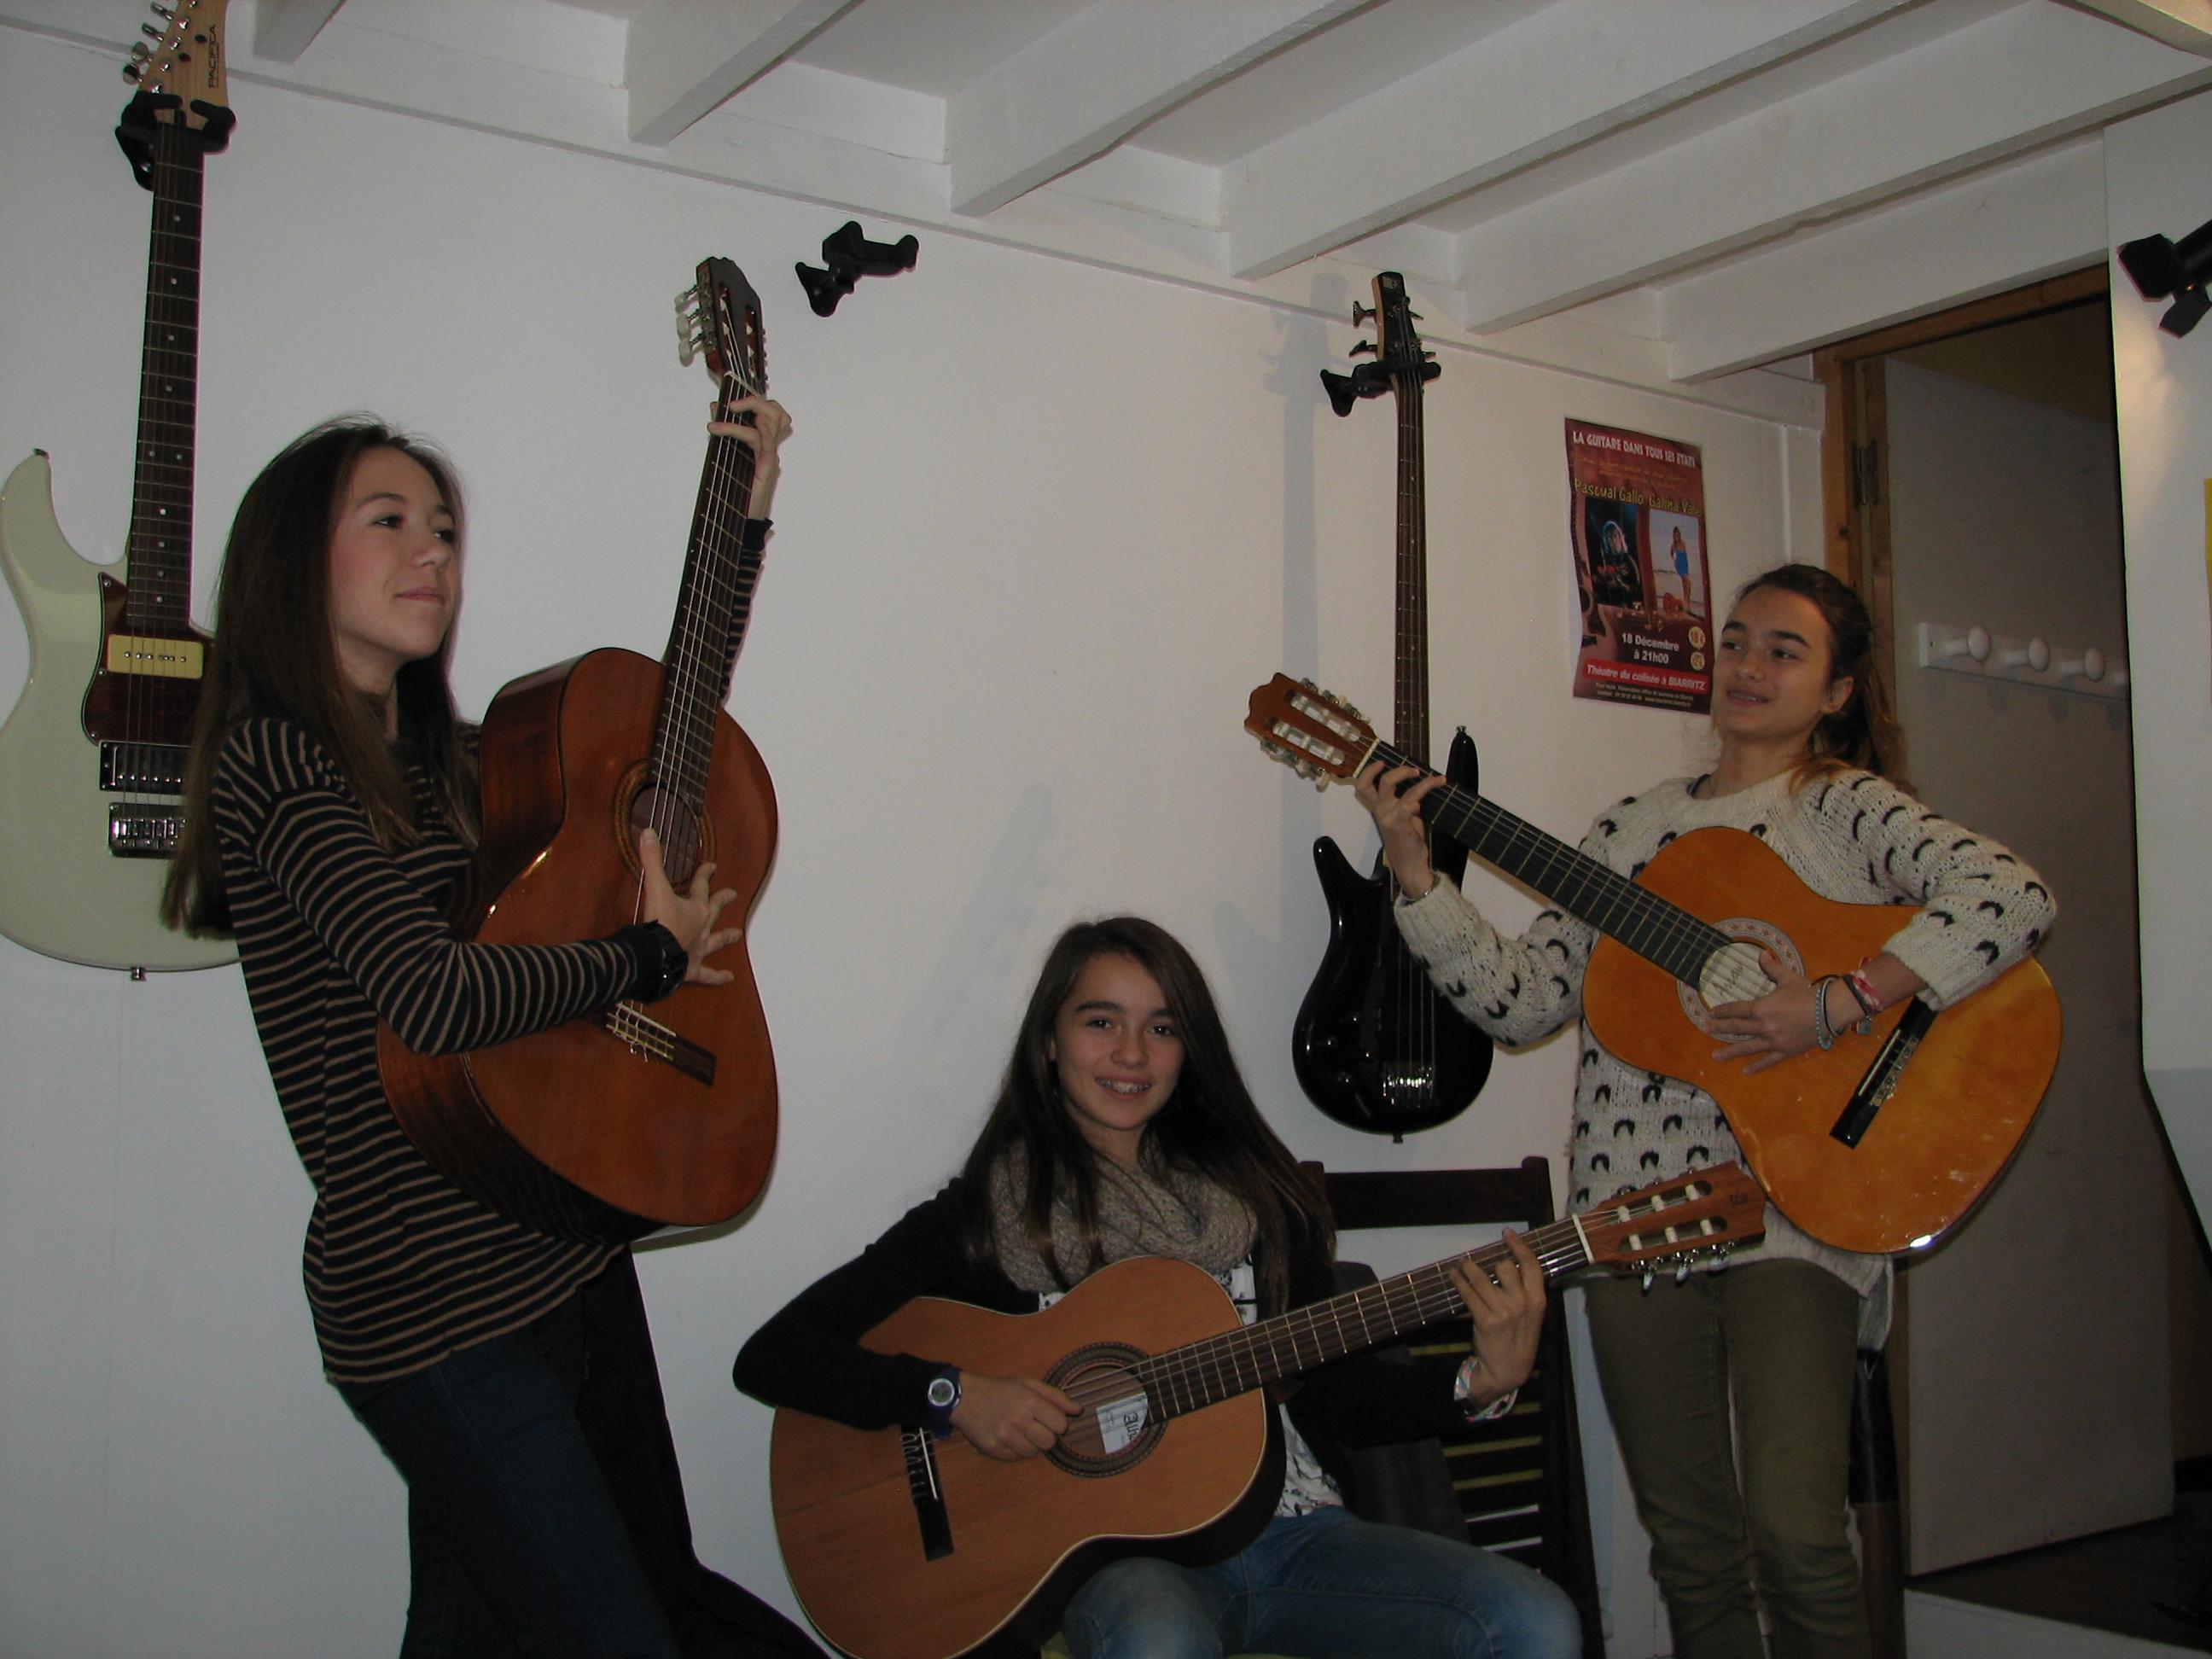 Charlotte, Camille et Louise